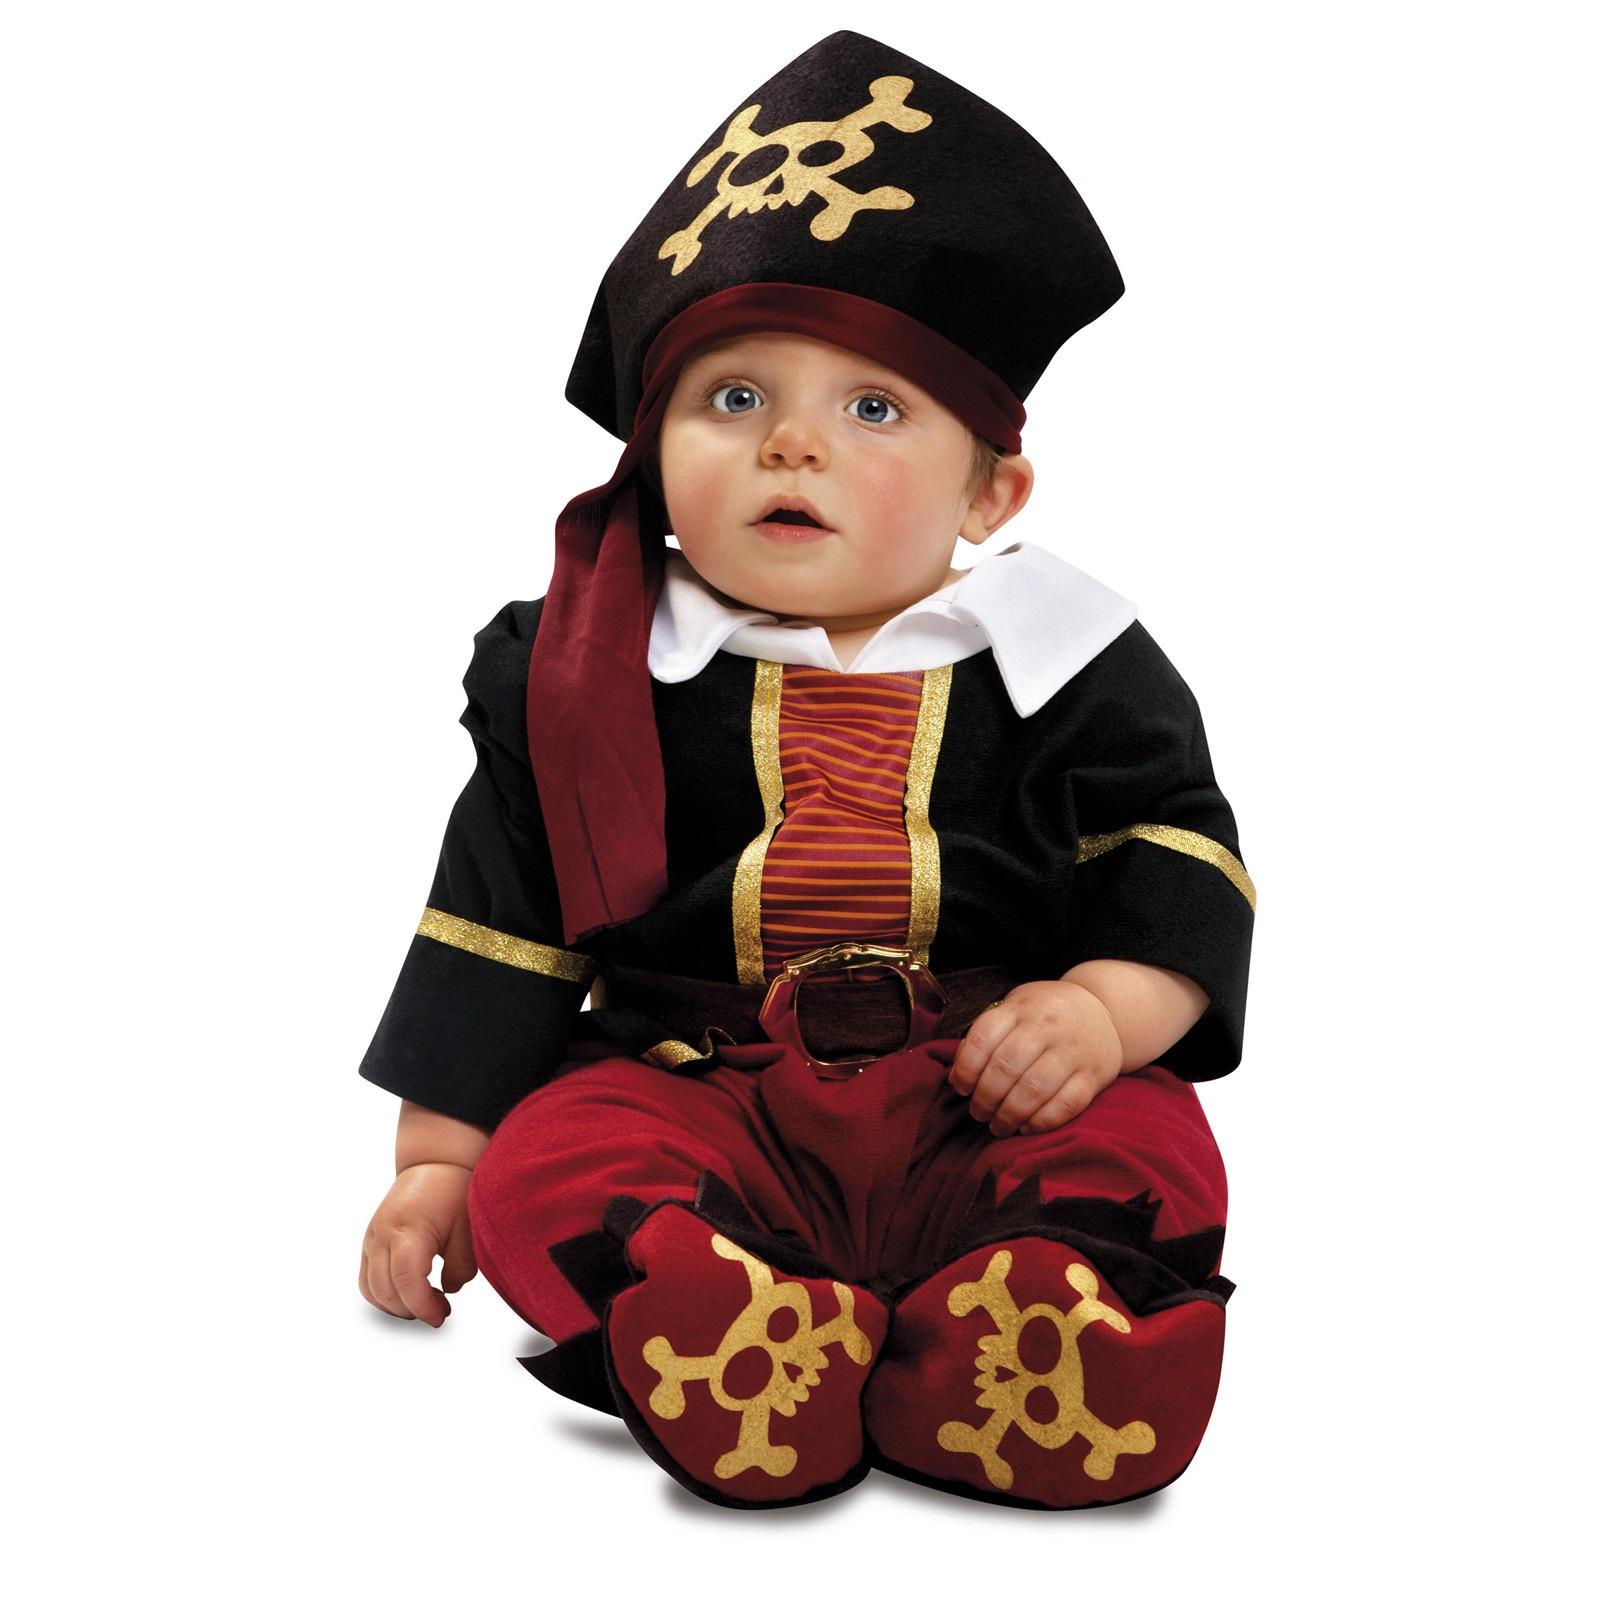 disfraz pirata bebé niño 203278mom - DISFRAZ DE PIRATA BEBE NIÑO